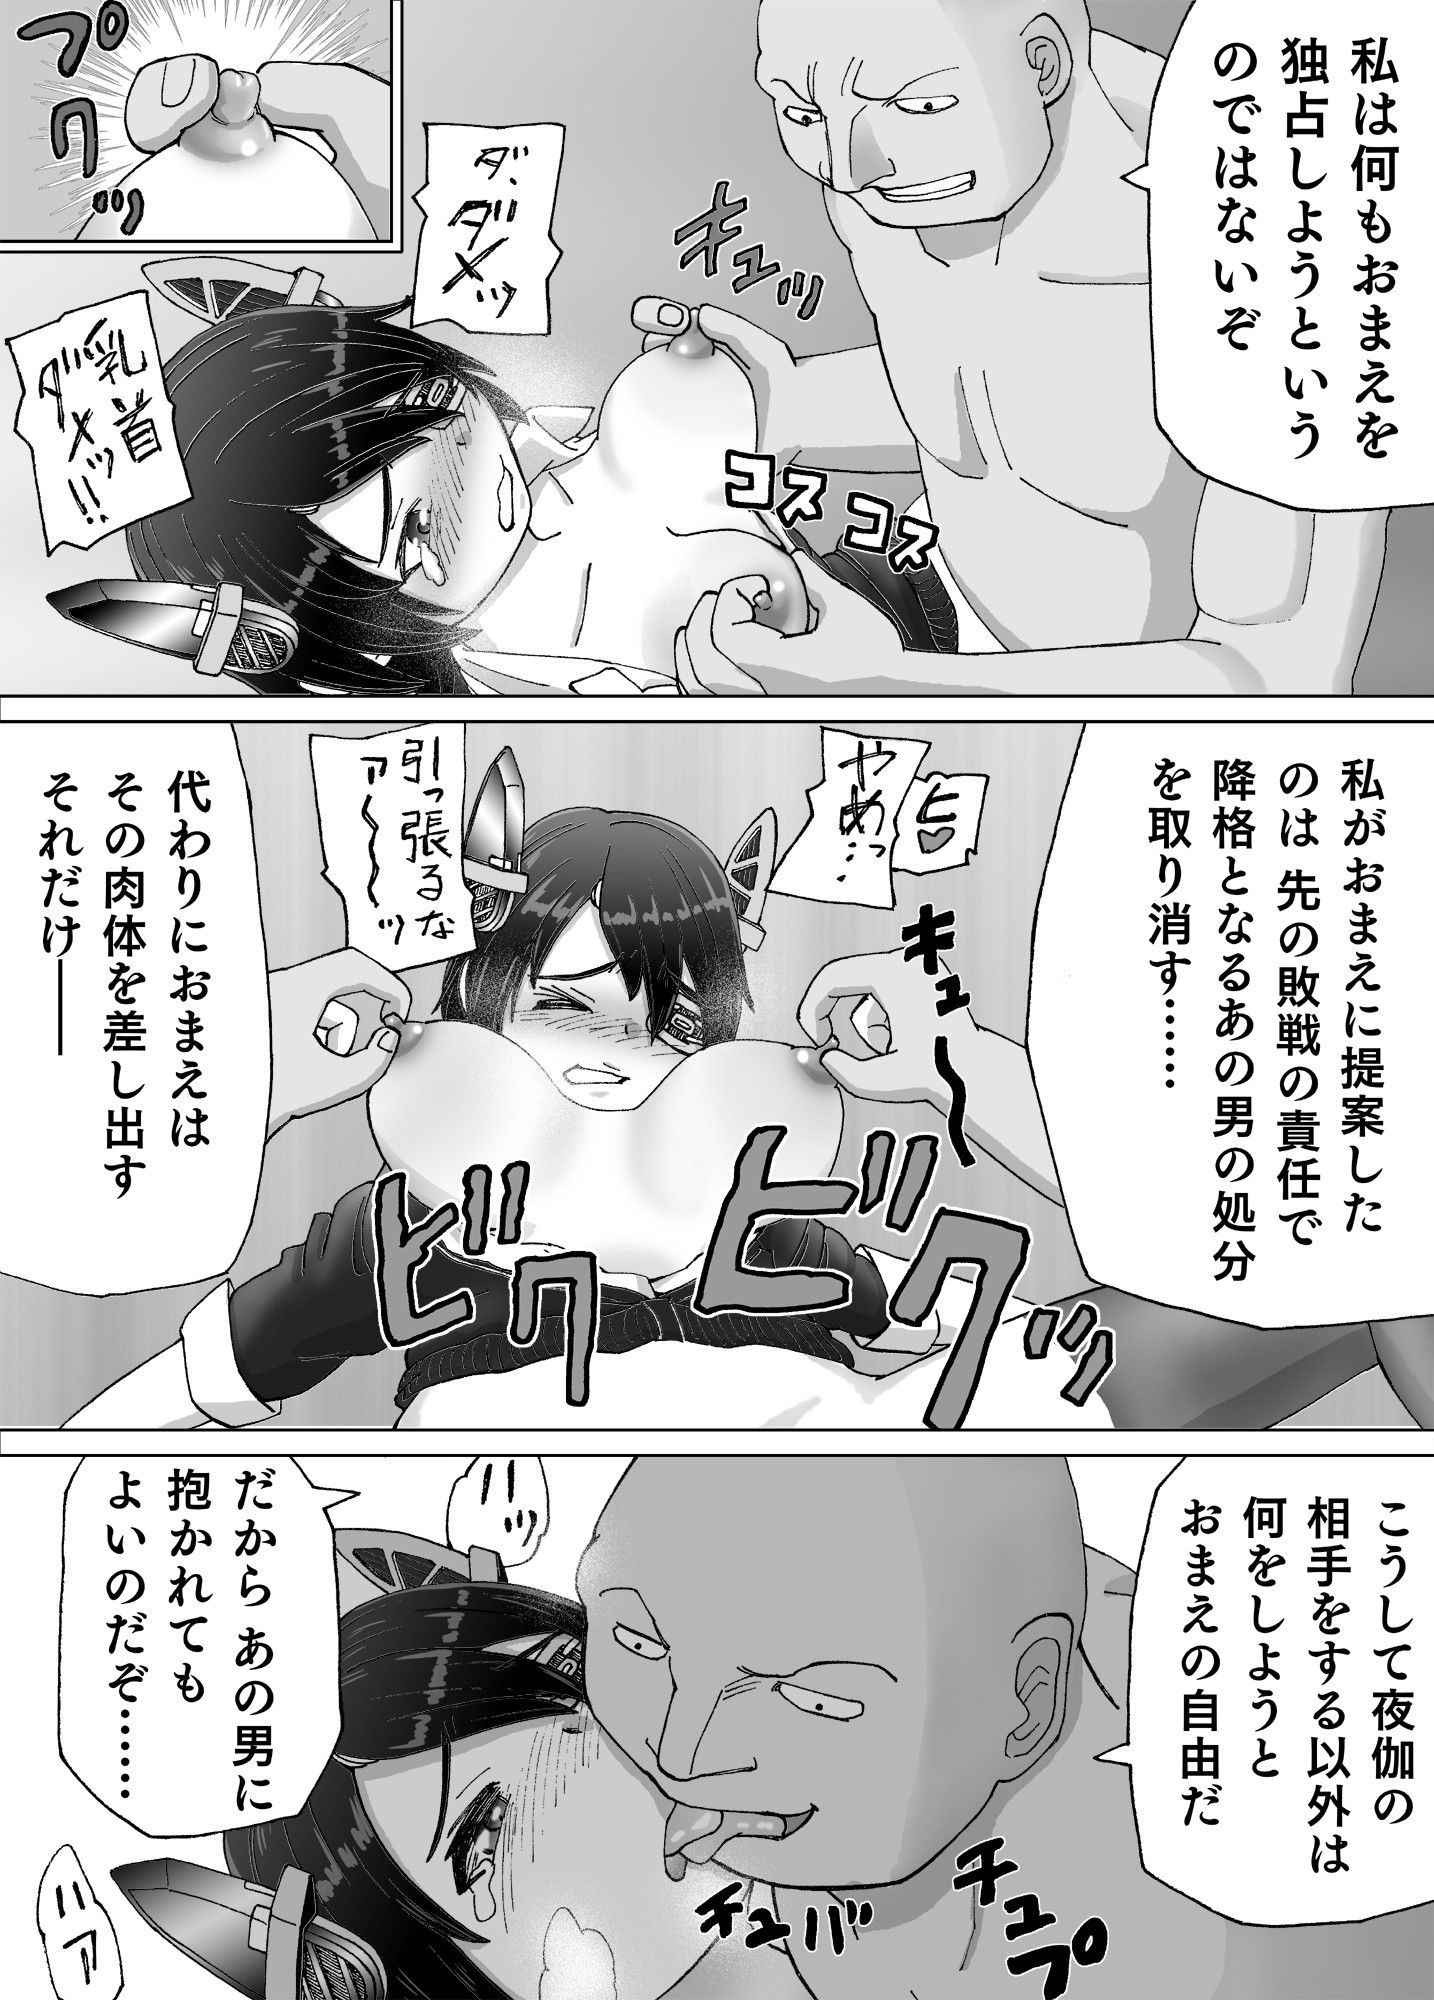 AVアニメなう [今すぐ読める同人サンプル] 「天龍が上官に寝取られた上に上官専用便器に改造さ...